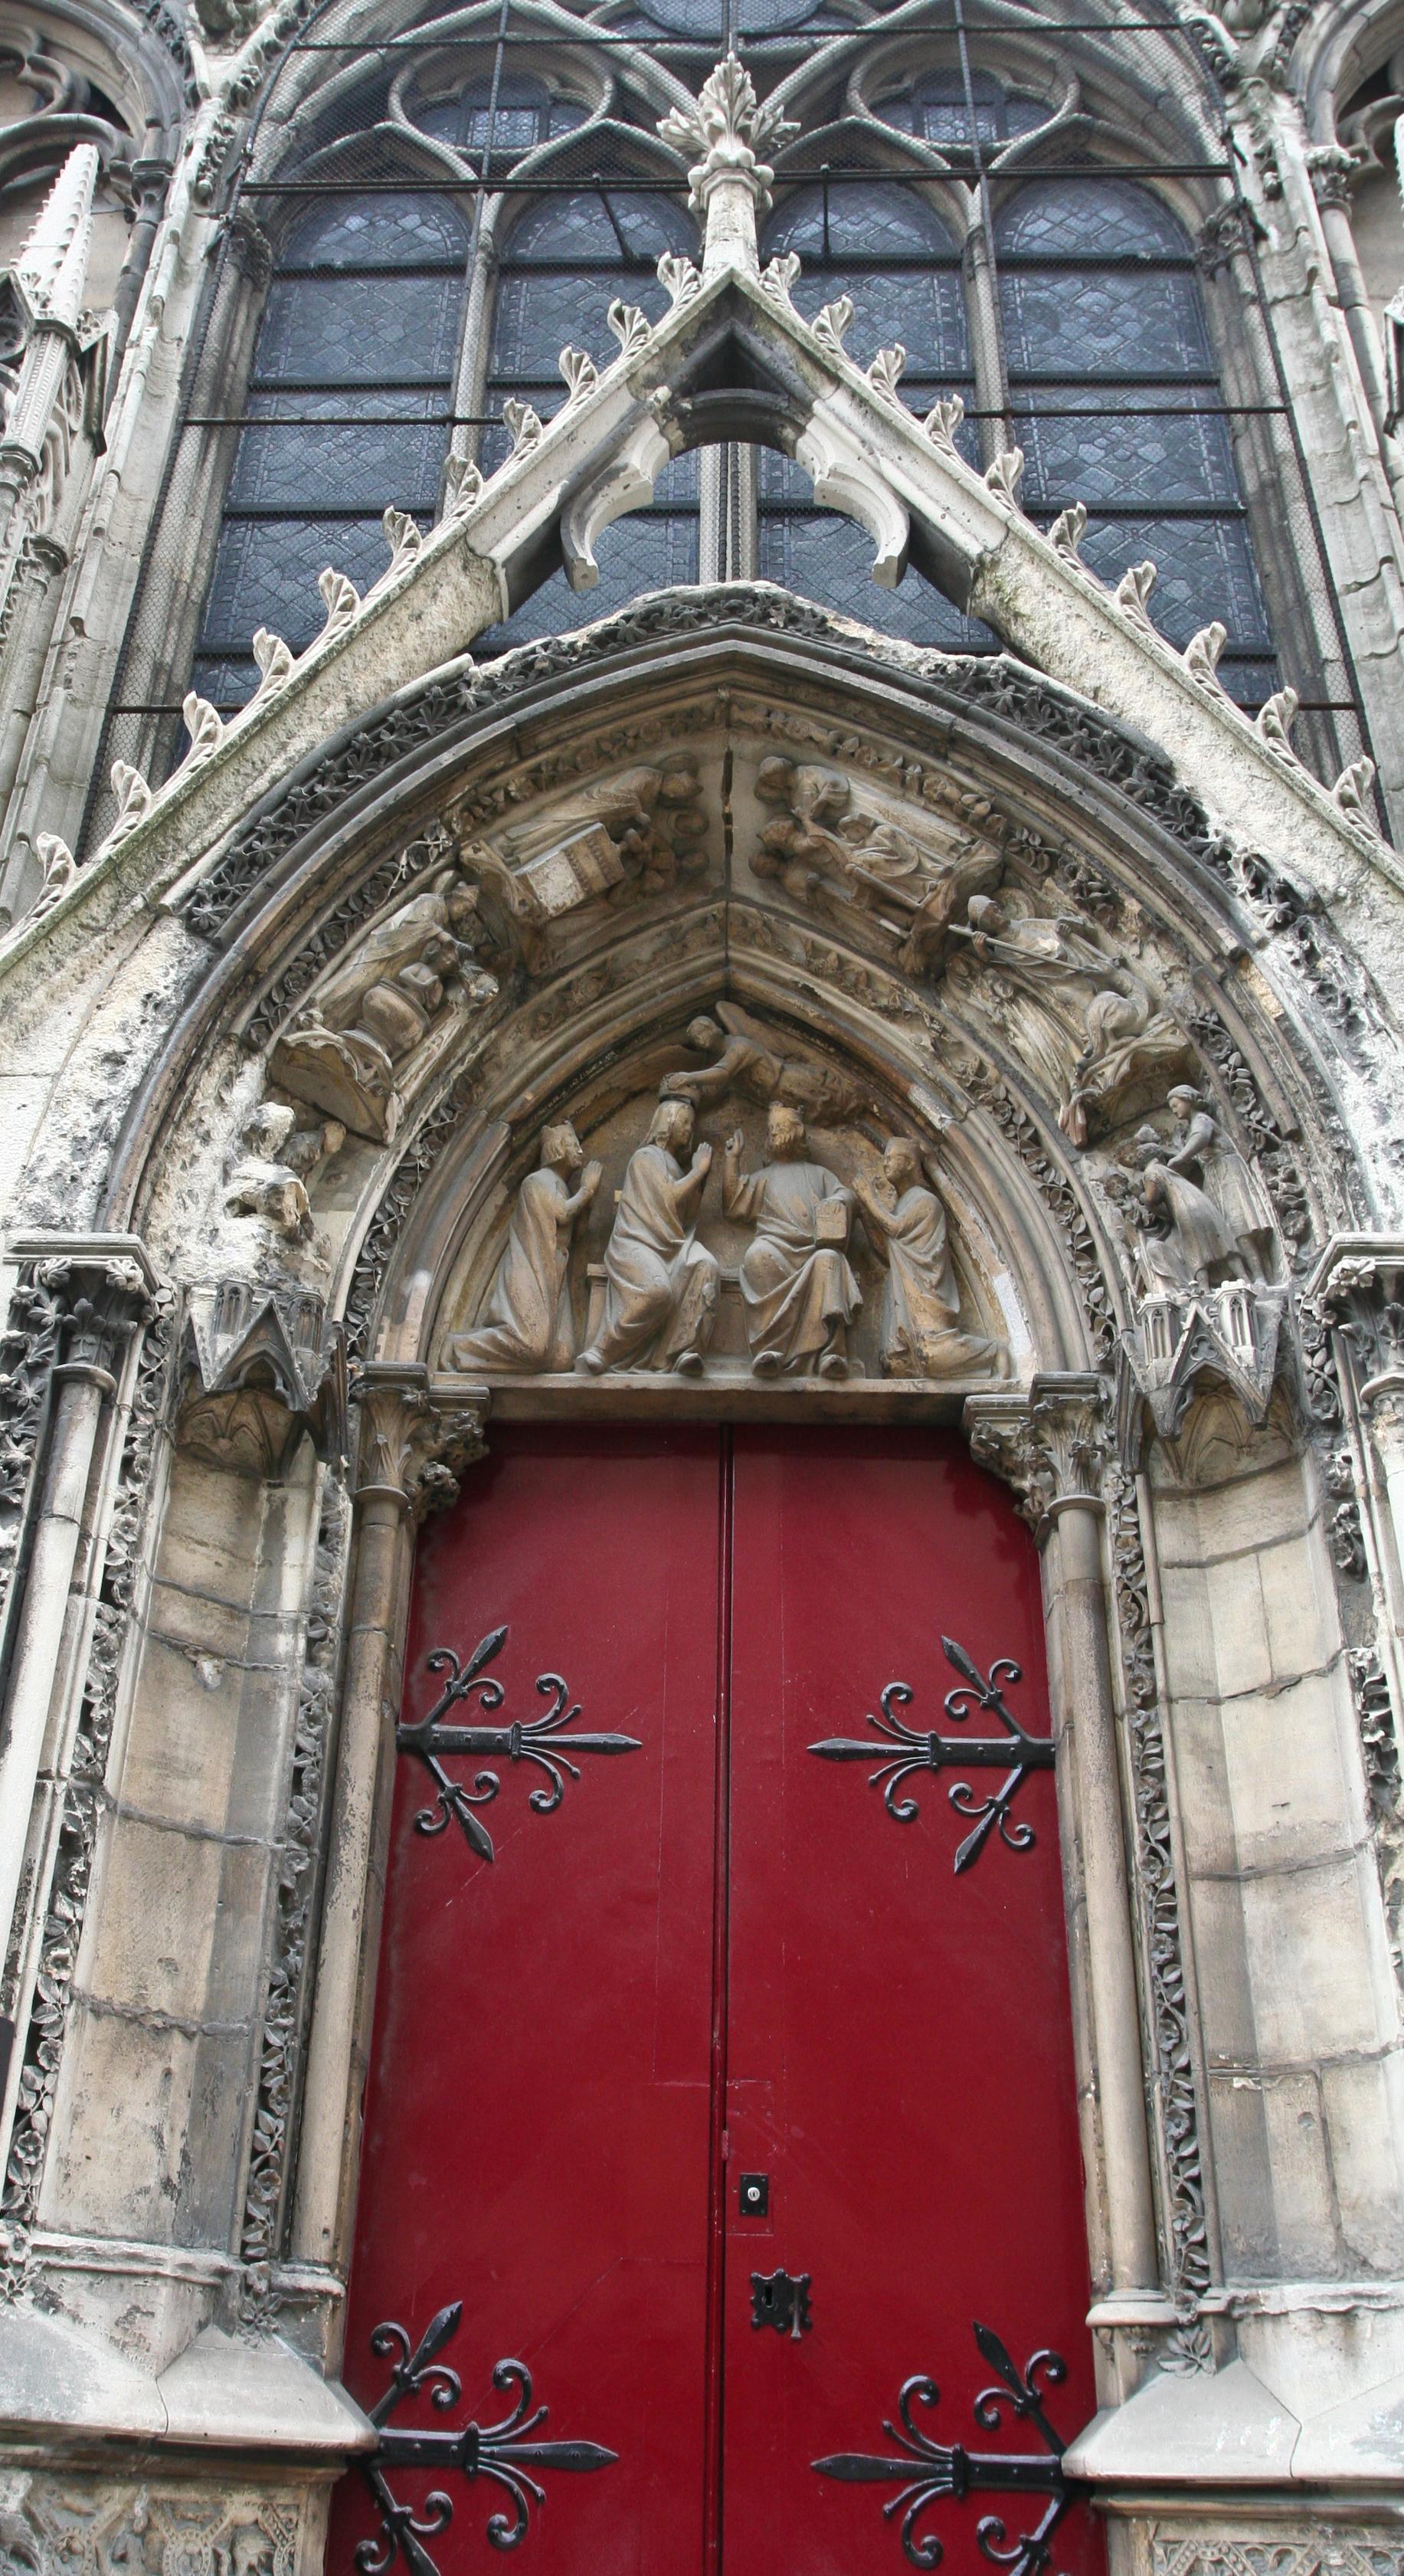 https://upload.wikimedia.org/wikipedia/commons/b/b9/Red_door_of_the_Notre-Dame%2C_Paris_29_May_2009.jpg